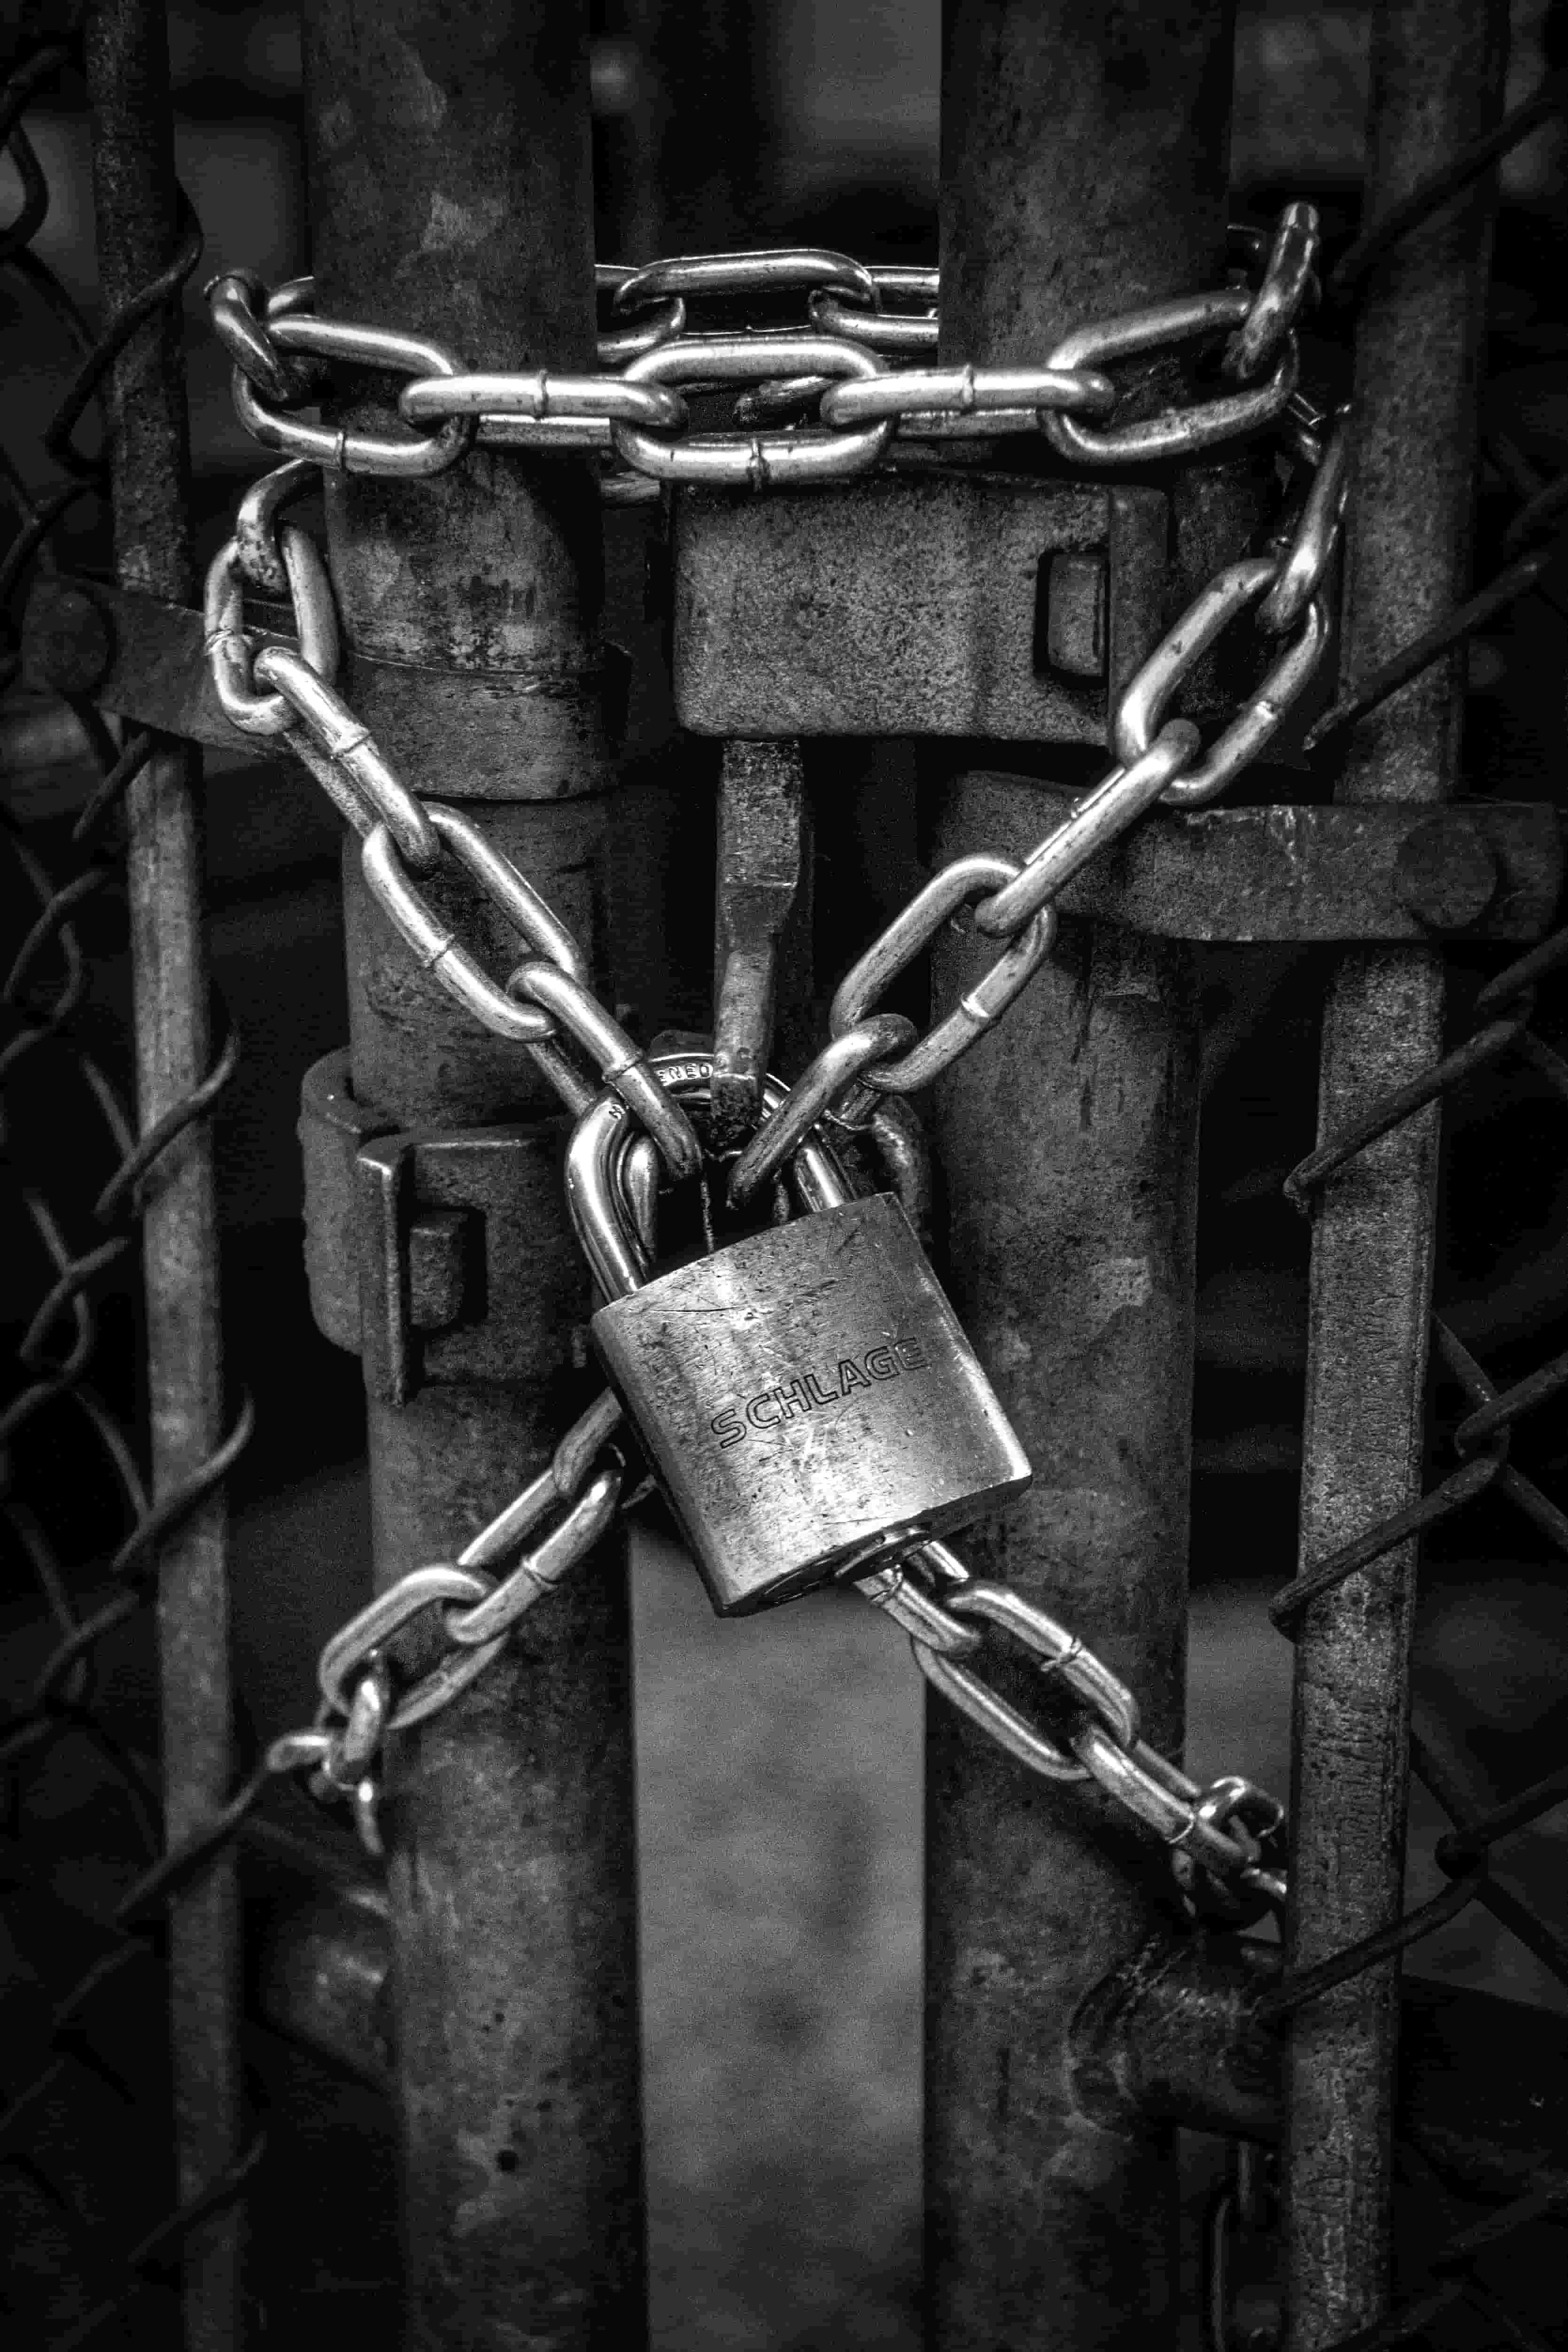 Secure transcription services keep data safe